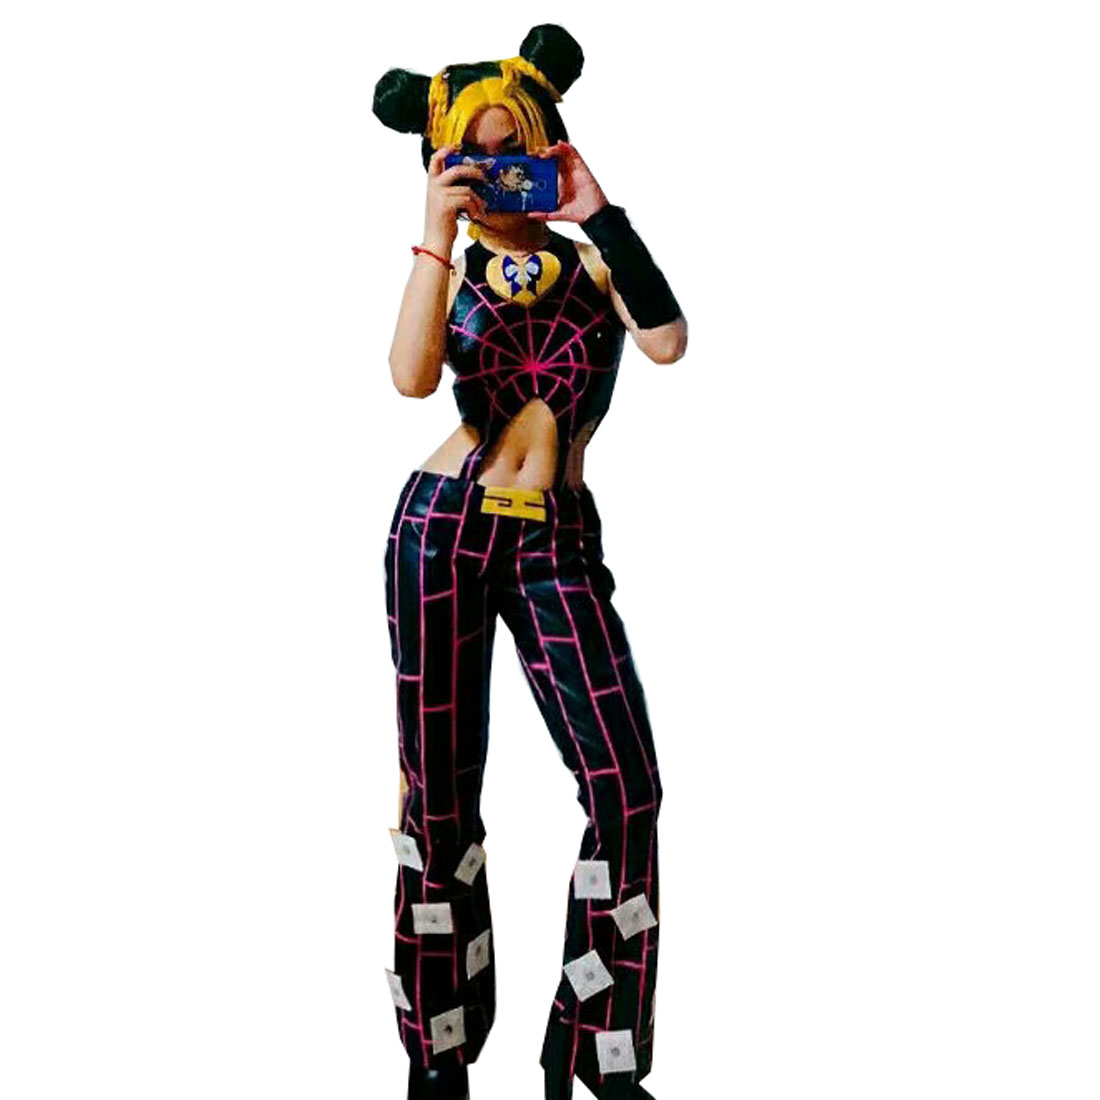 2019 JoJo's Bizarre Adventure Cosplay Jolyne Cujoh Kujo Costume Top+Pant